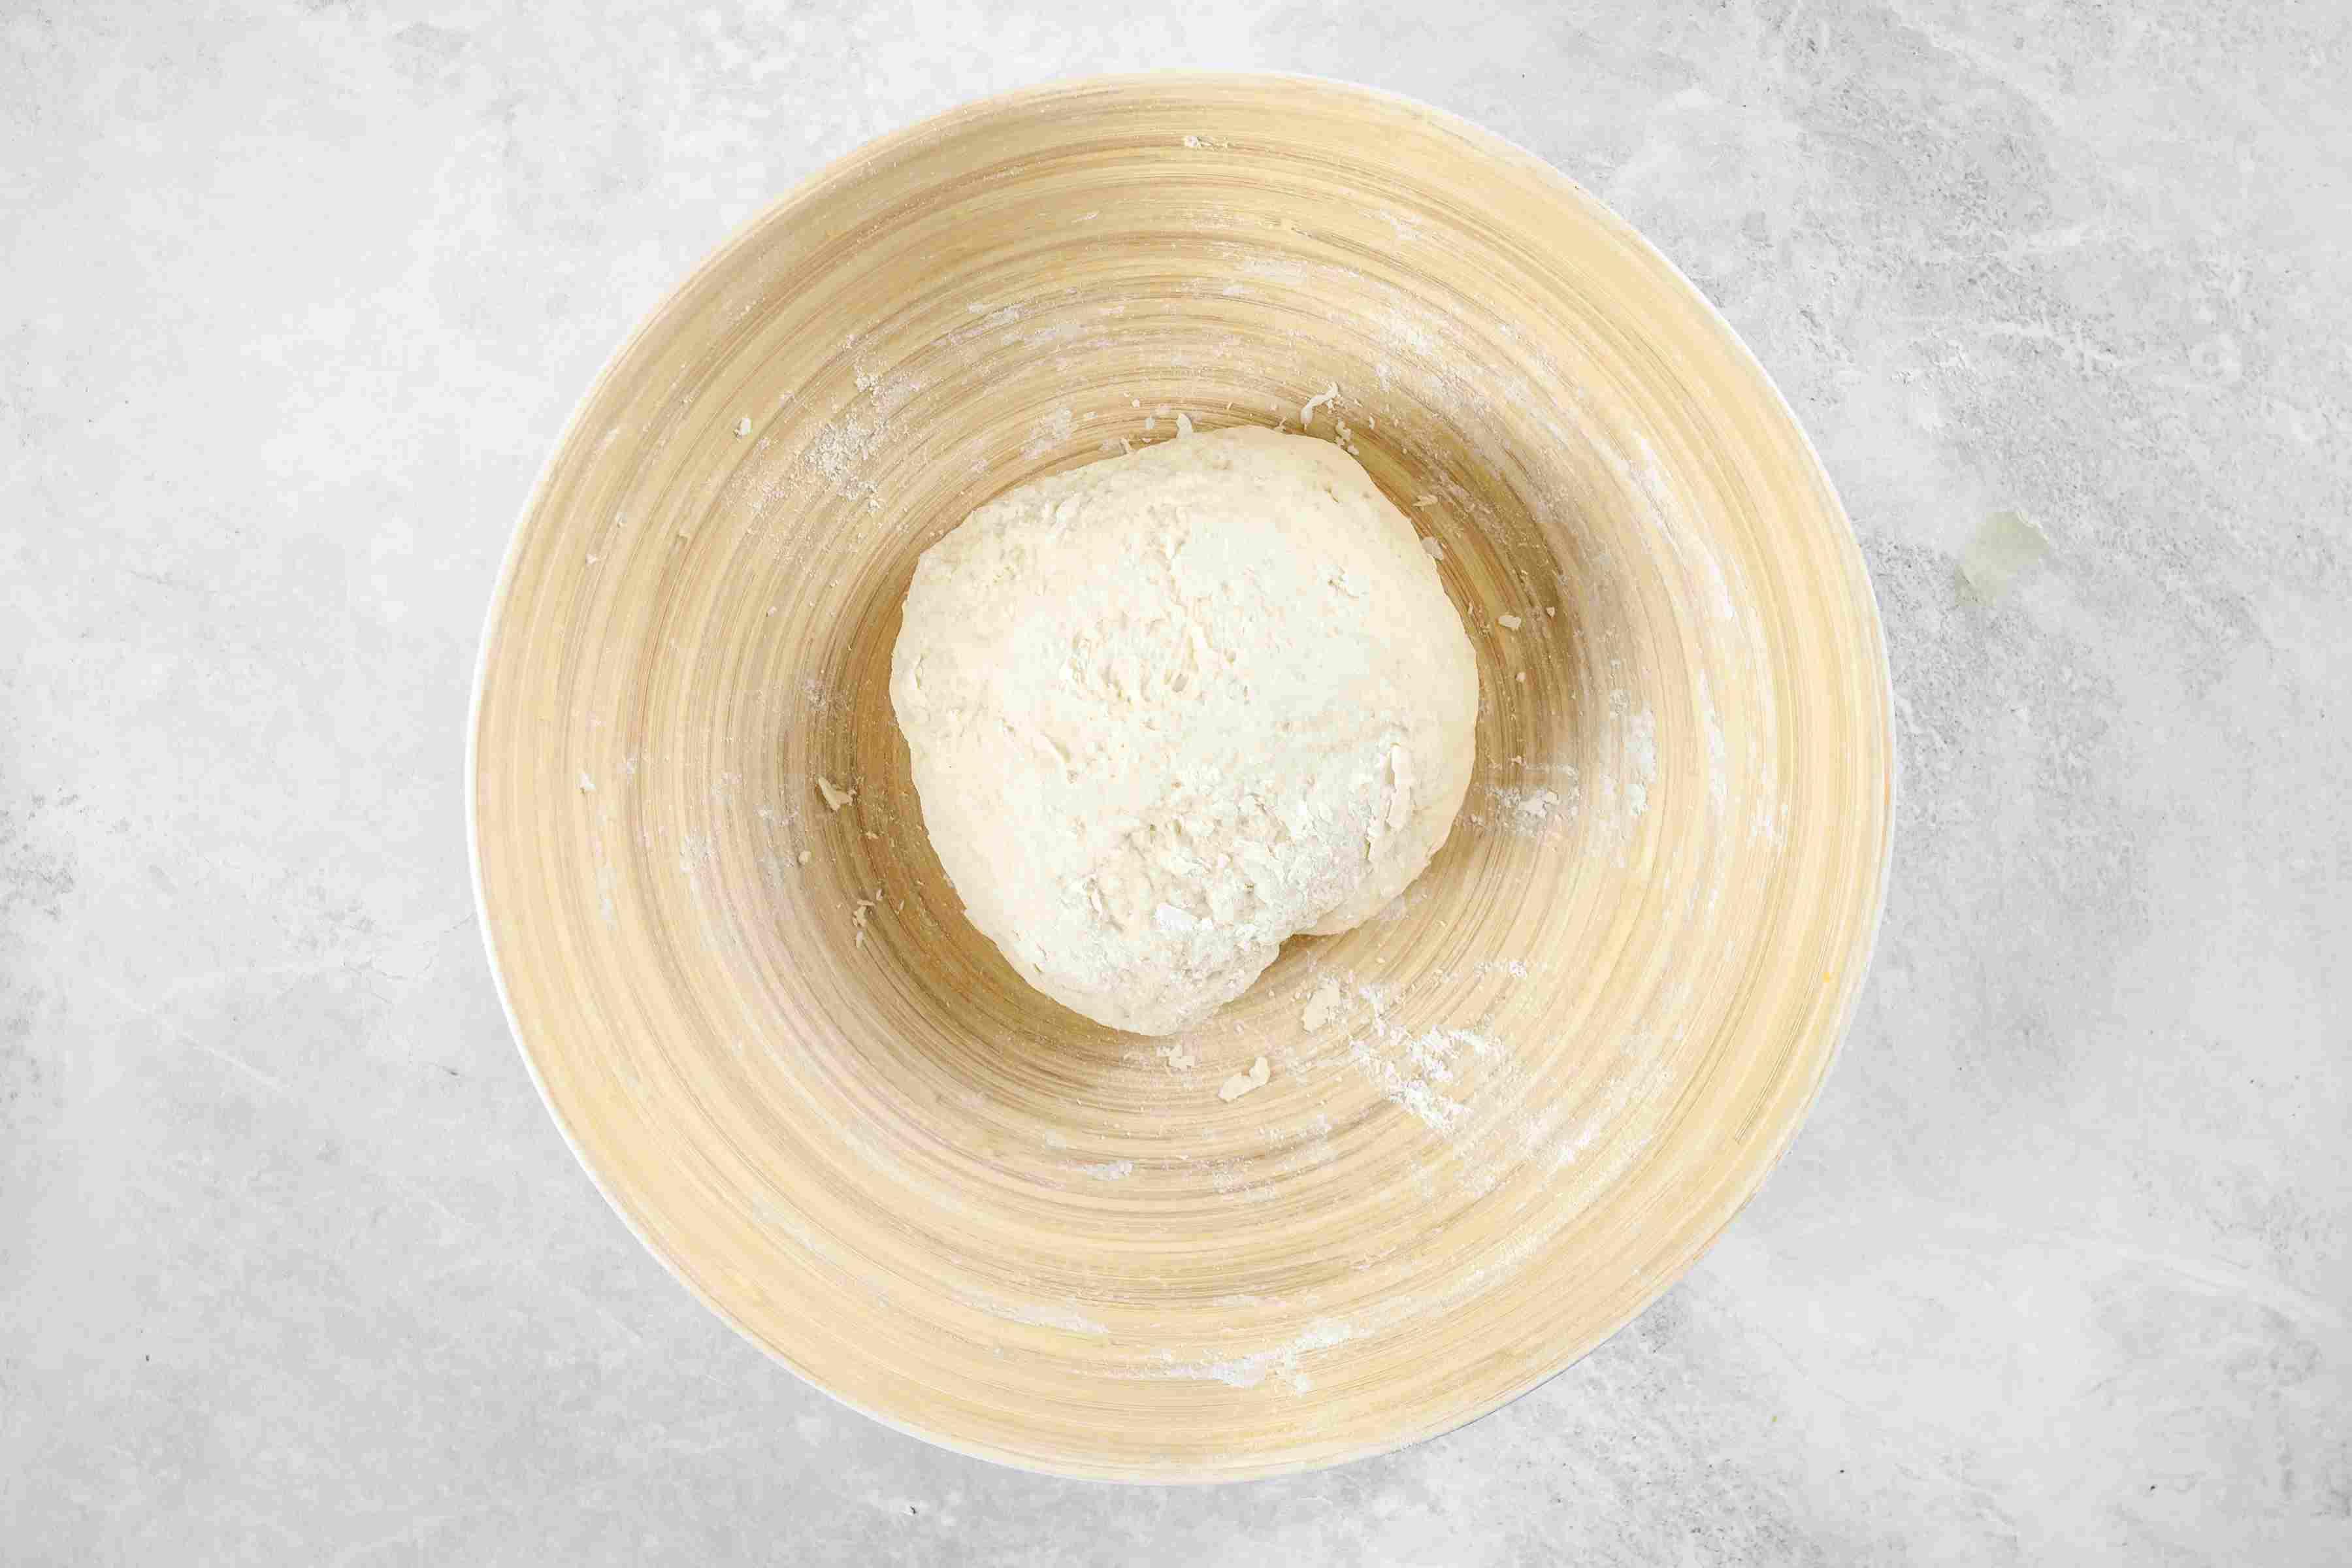 Add the flour mixture